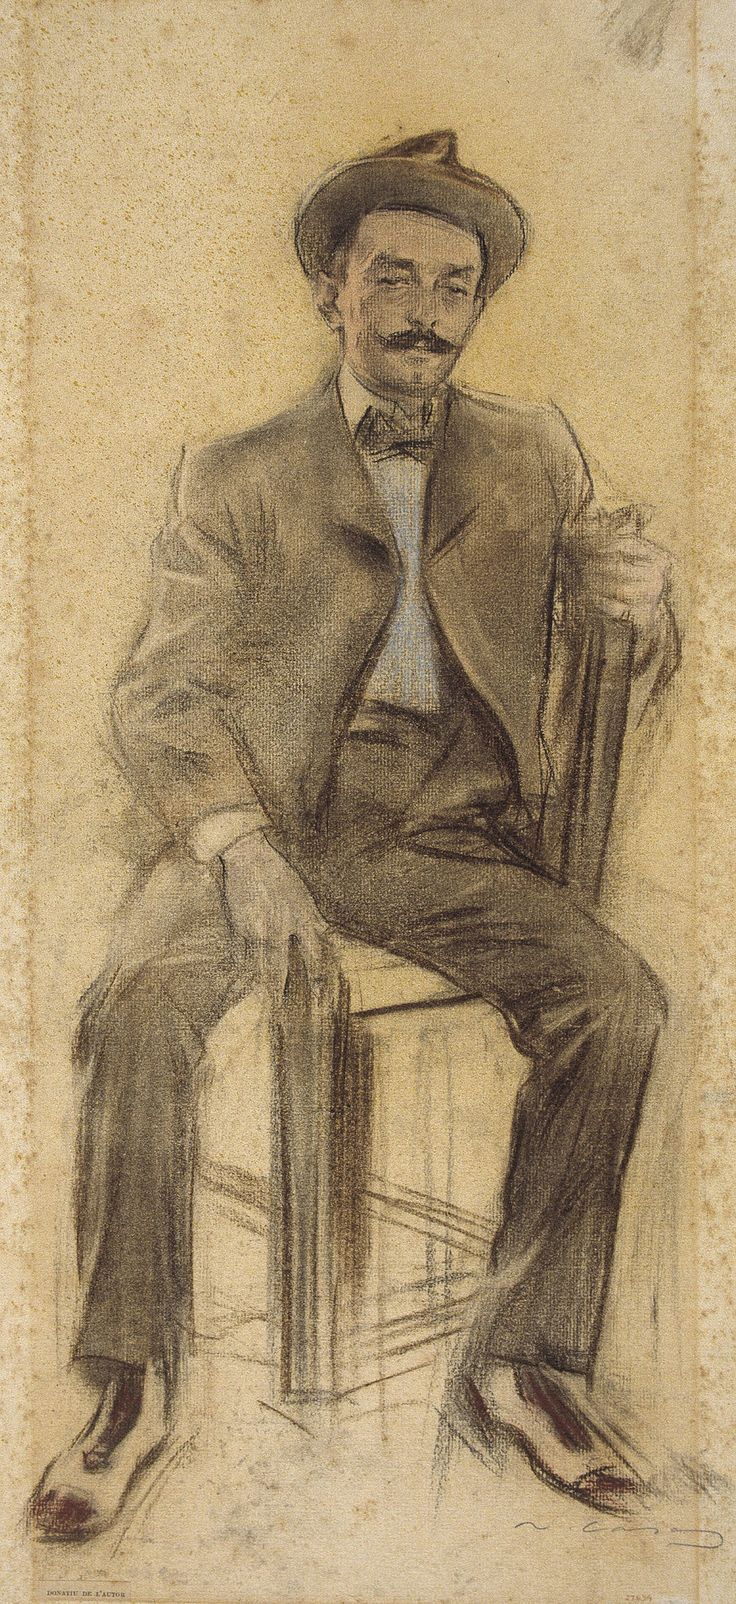 Celestí Galceran by Ramon Casas i Carbó (Catalan/Spanish 1866-1932)